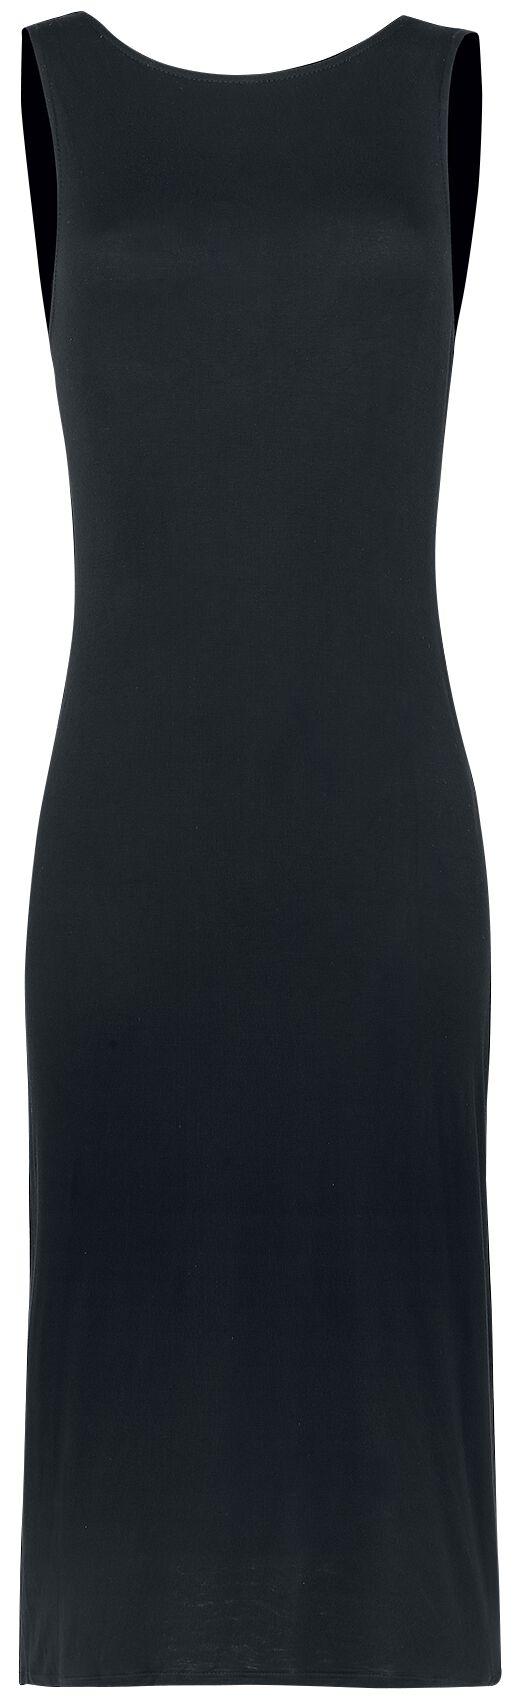 Image of   Forplay Double Layer Dress Kjole sort-koks